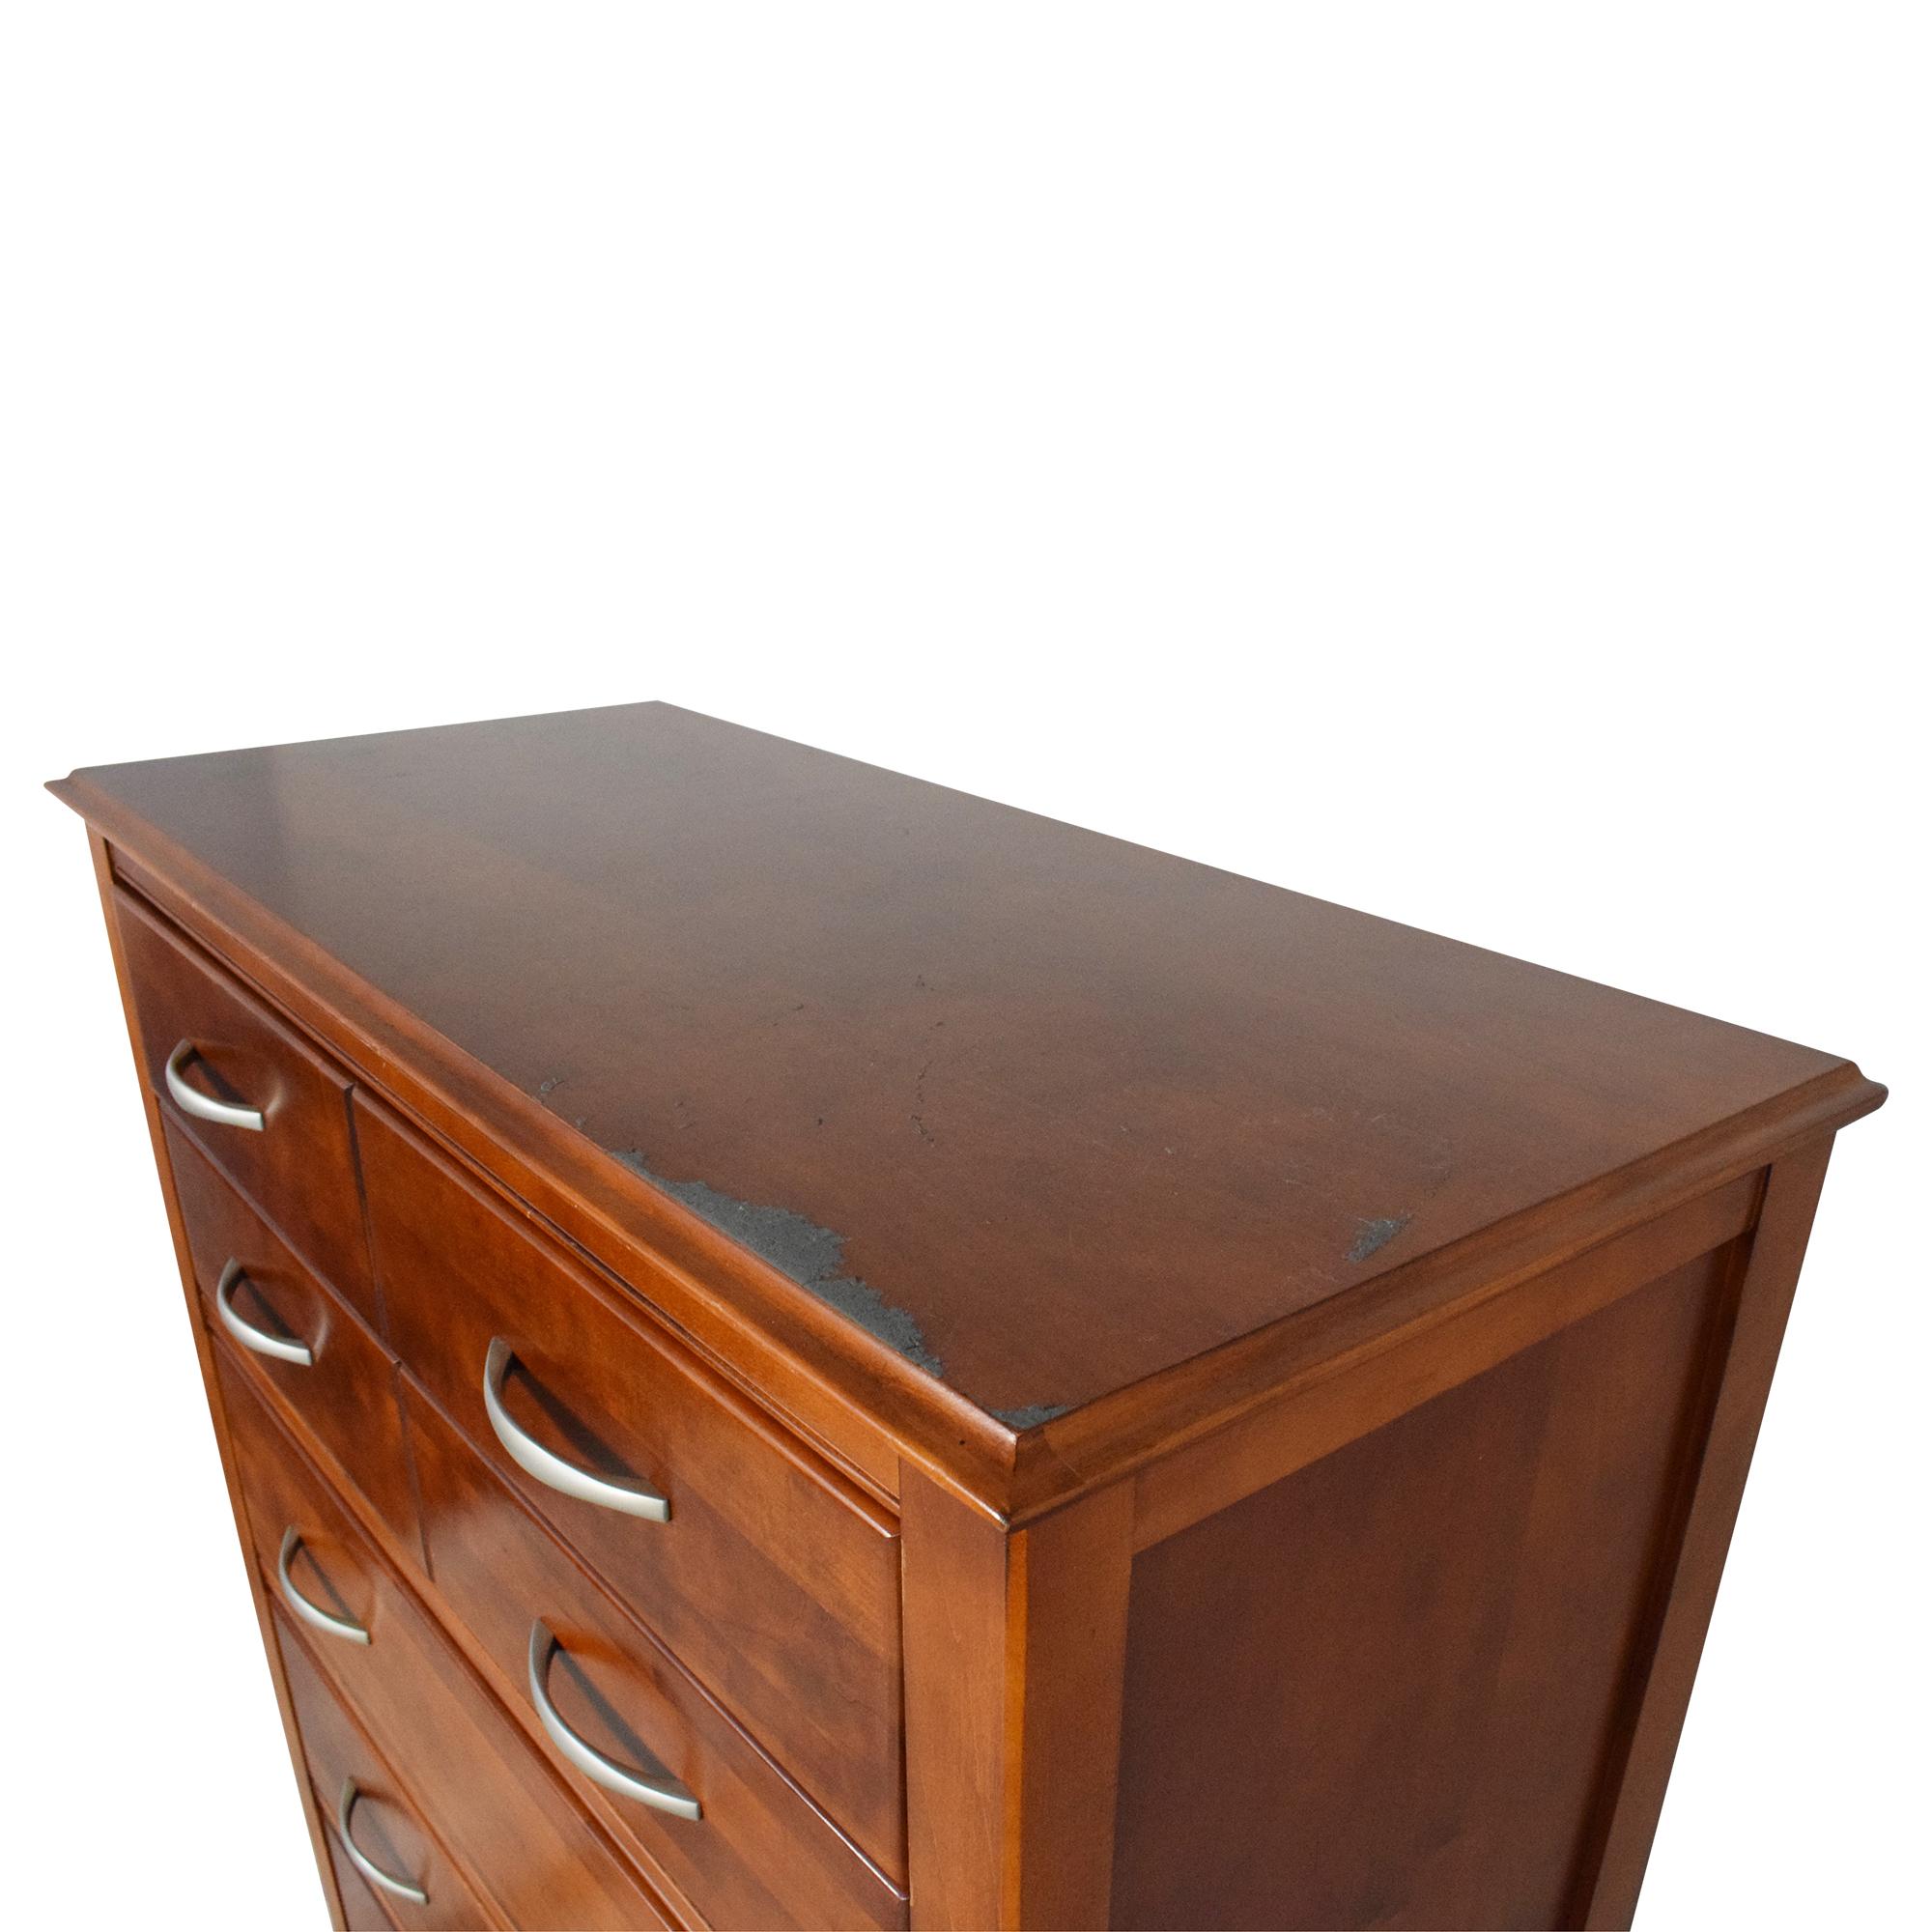 Bassett Furniture Bassett Furniture Fifth Avenue Dresser used